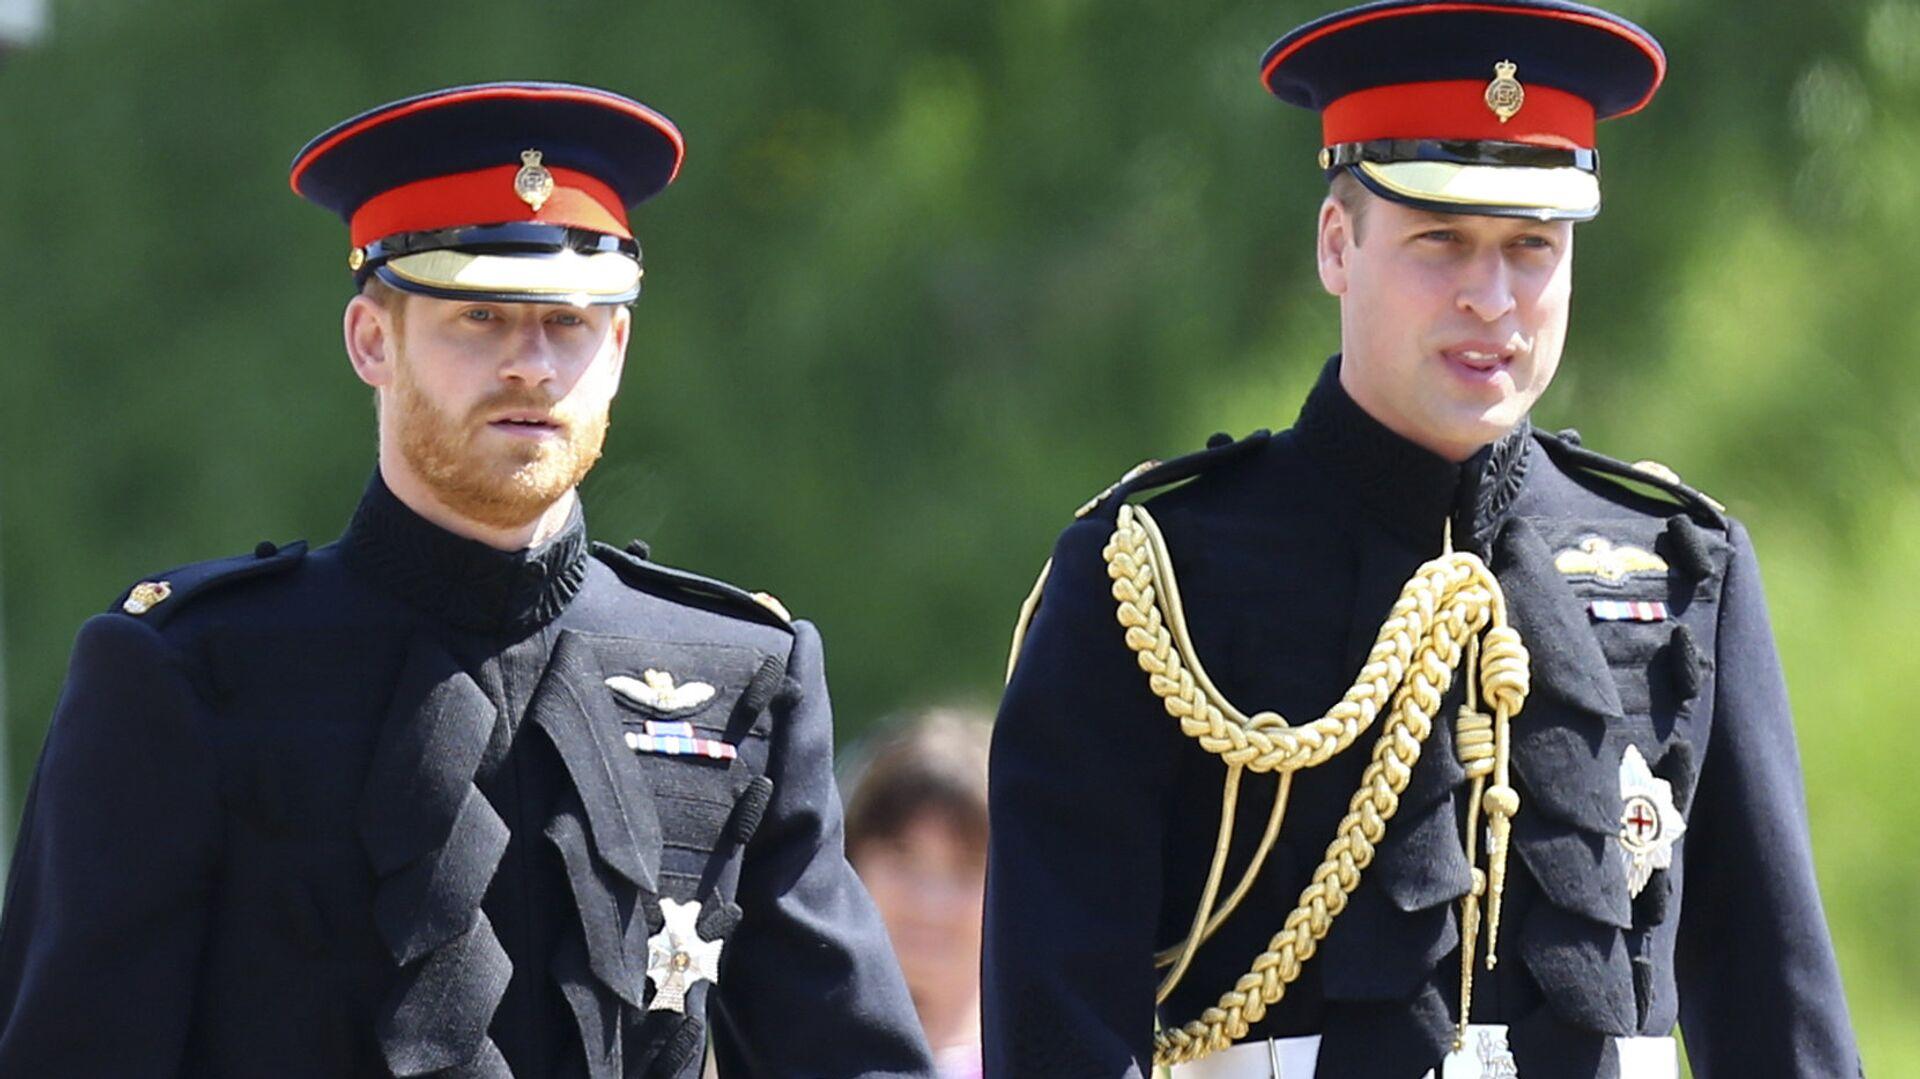 Principe Harry e principe William - Sputnik Italia, 1920, 05.04.2021